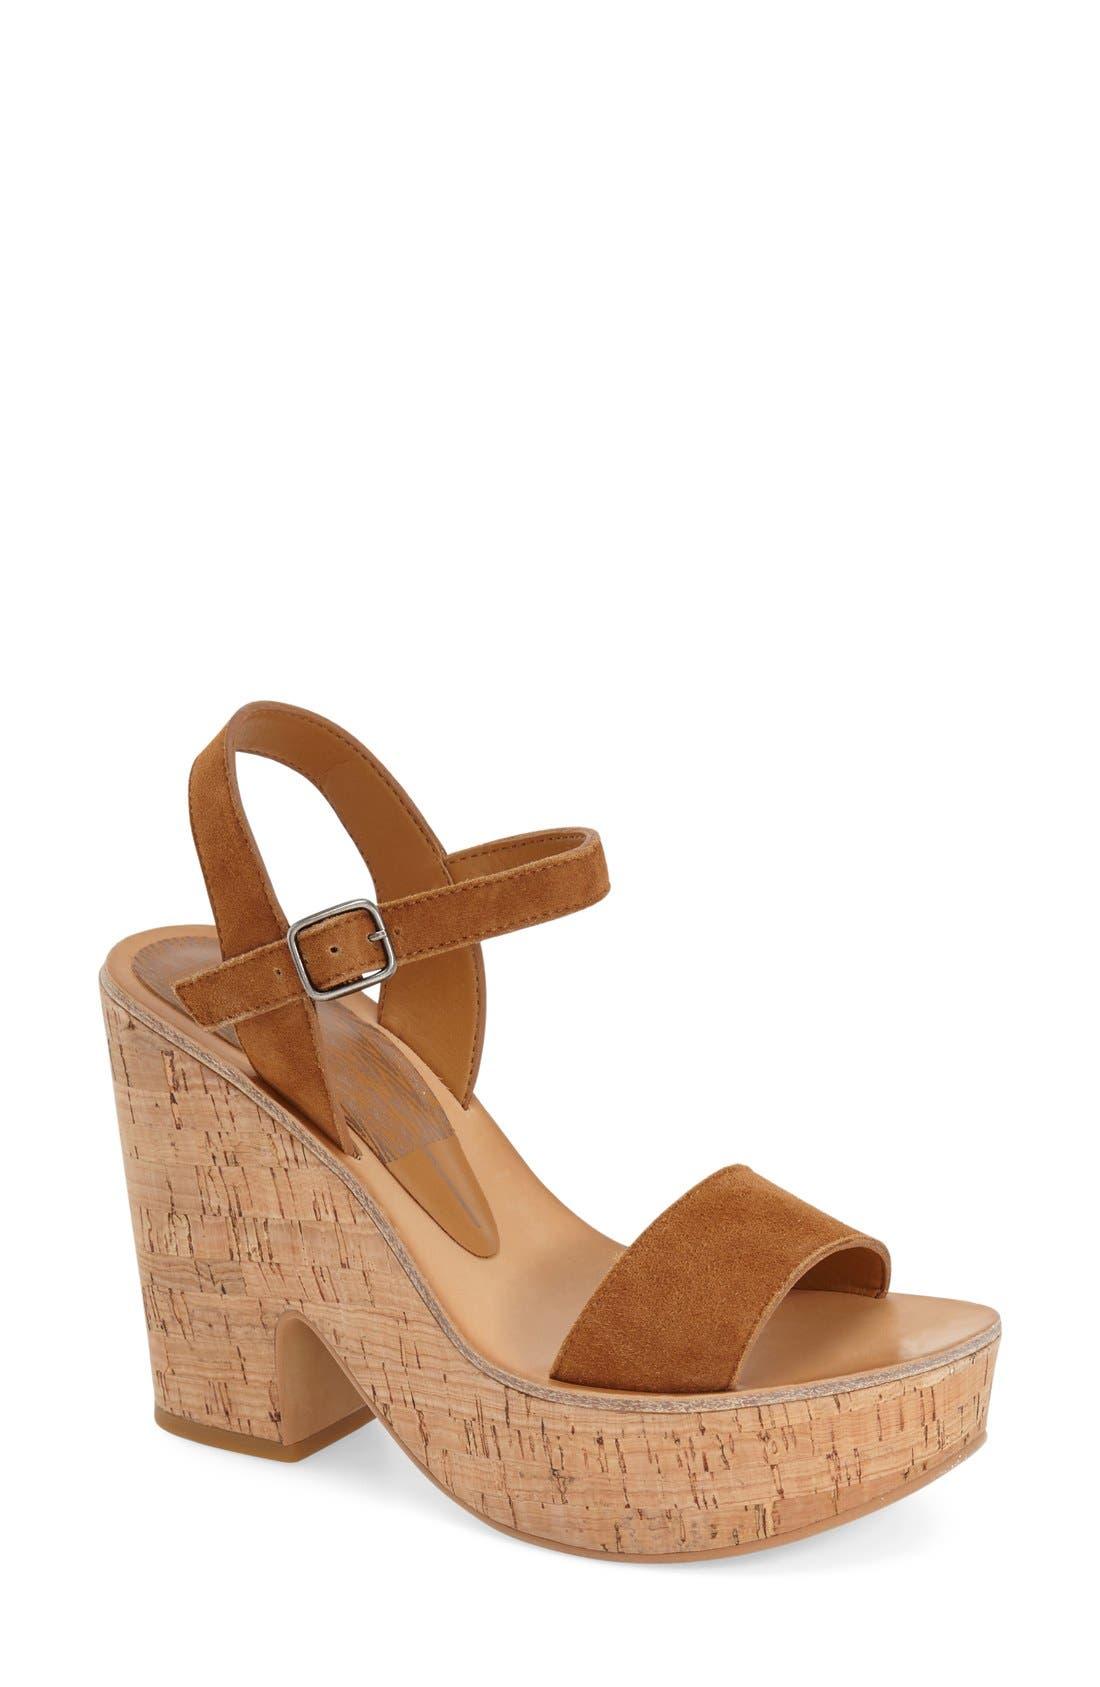 Main Image - Dolce Vita 'Randi' Platform Sandal (Women)